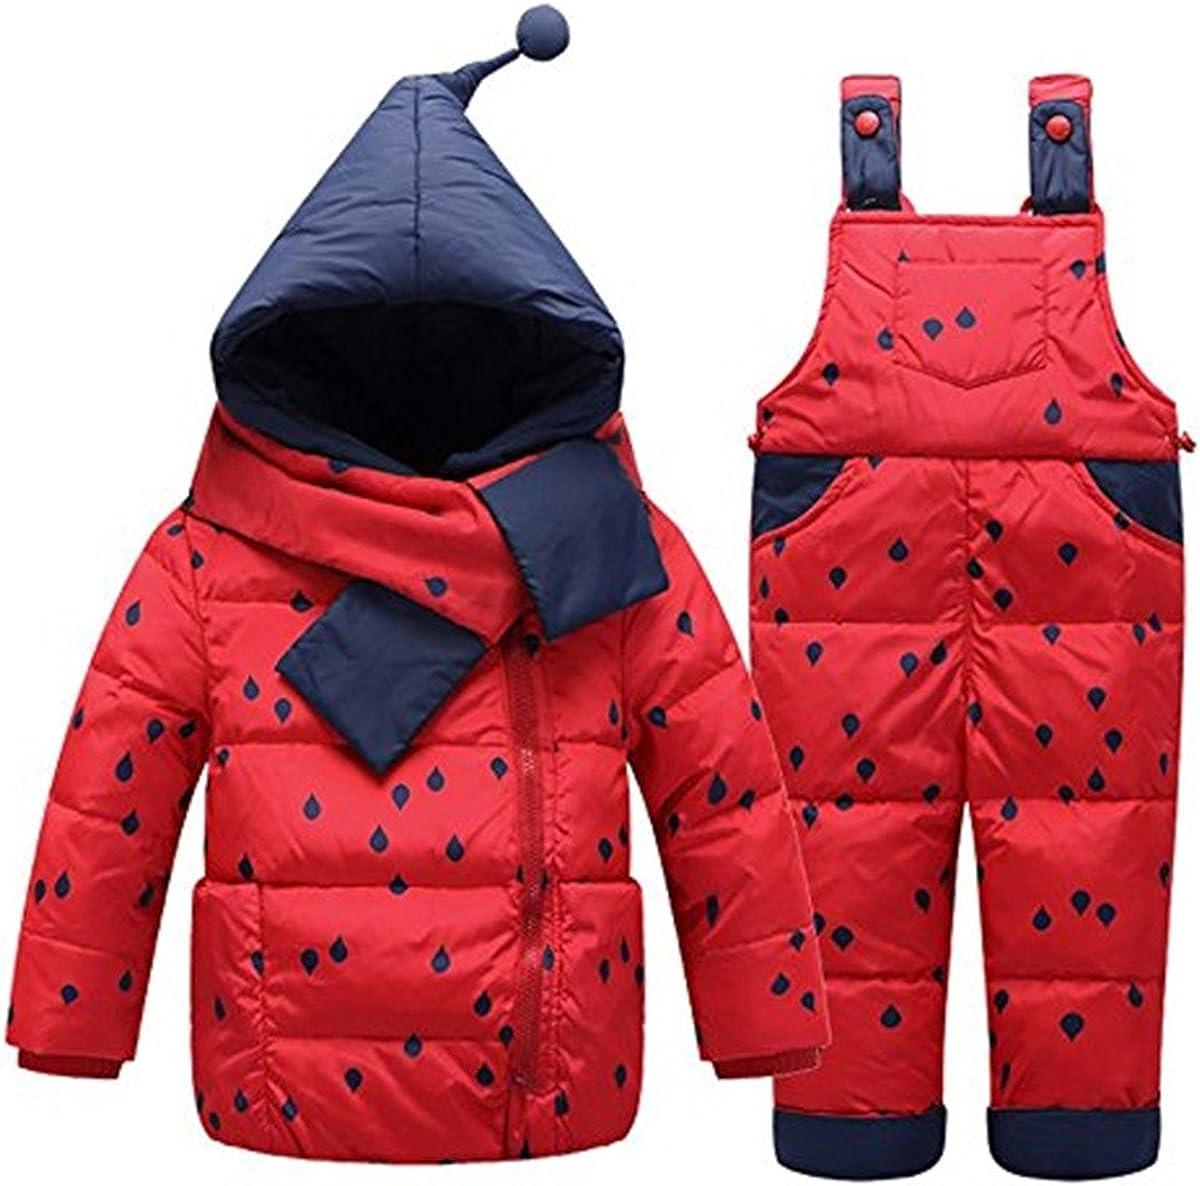 Baby Girls Two Piece Puffer Down Winter Warm Scarf Dot Printed Snowsuit Jacket with Snow Ski Bib Pants